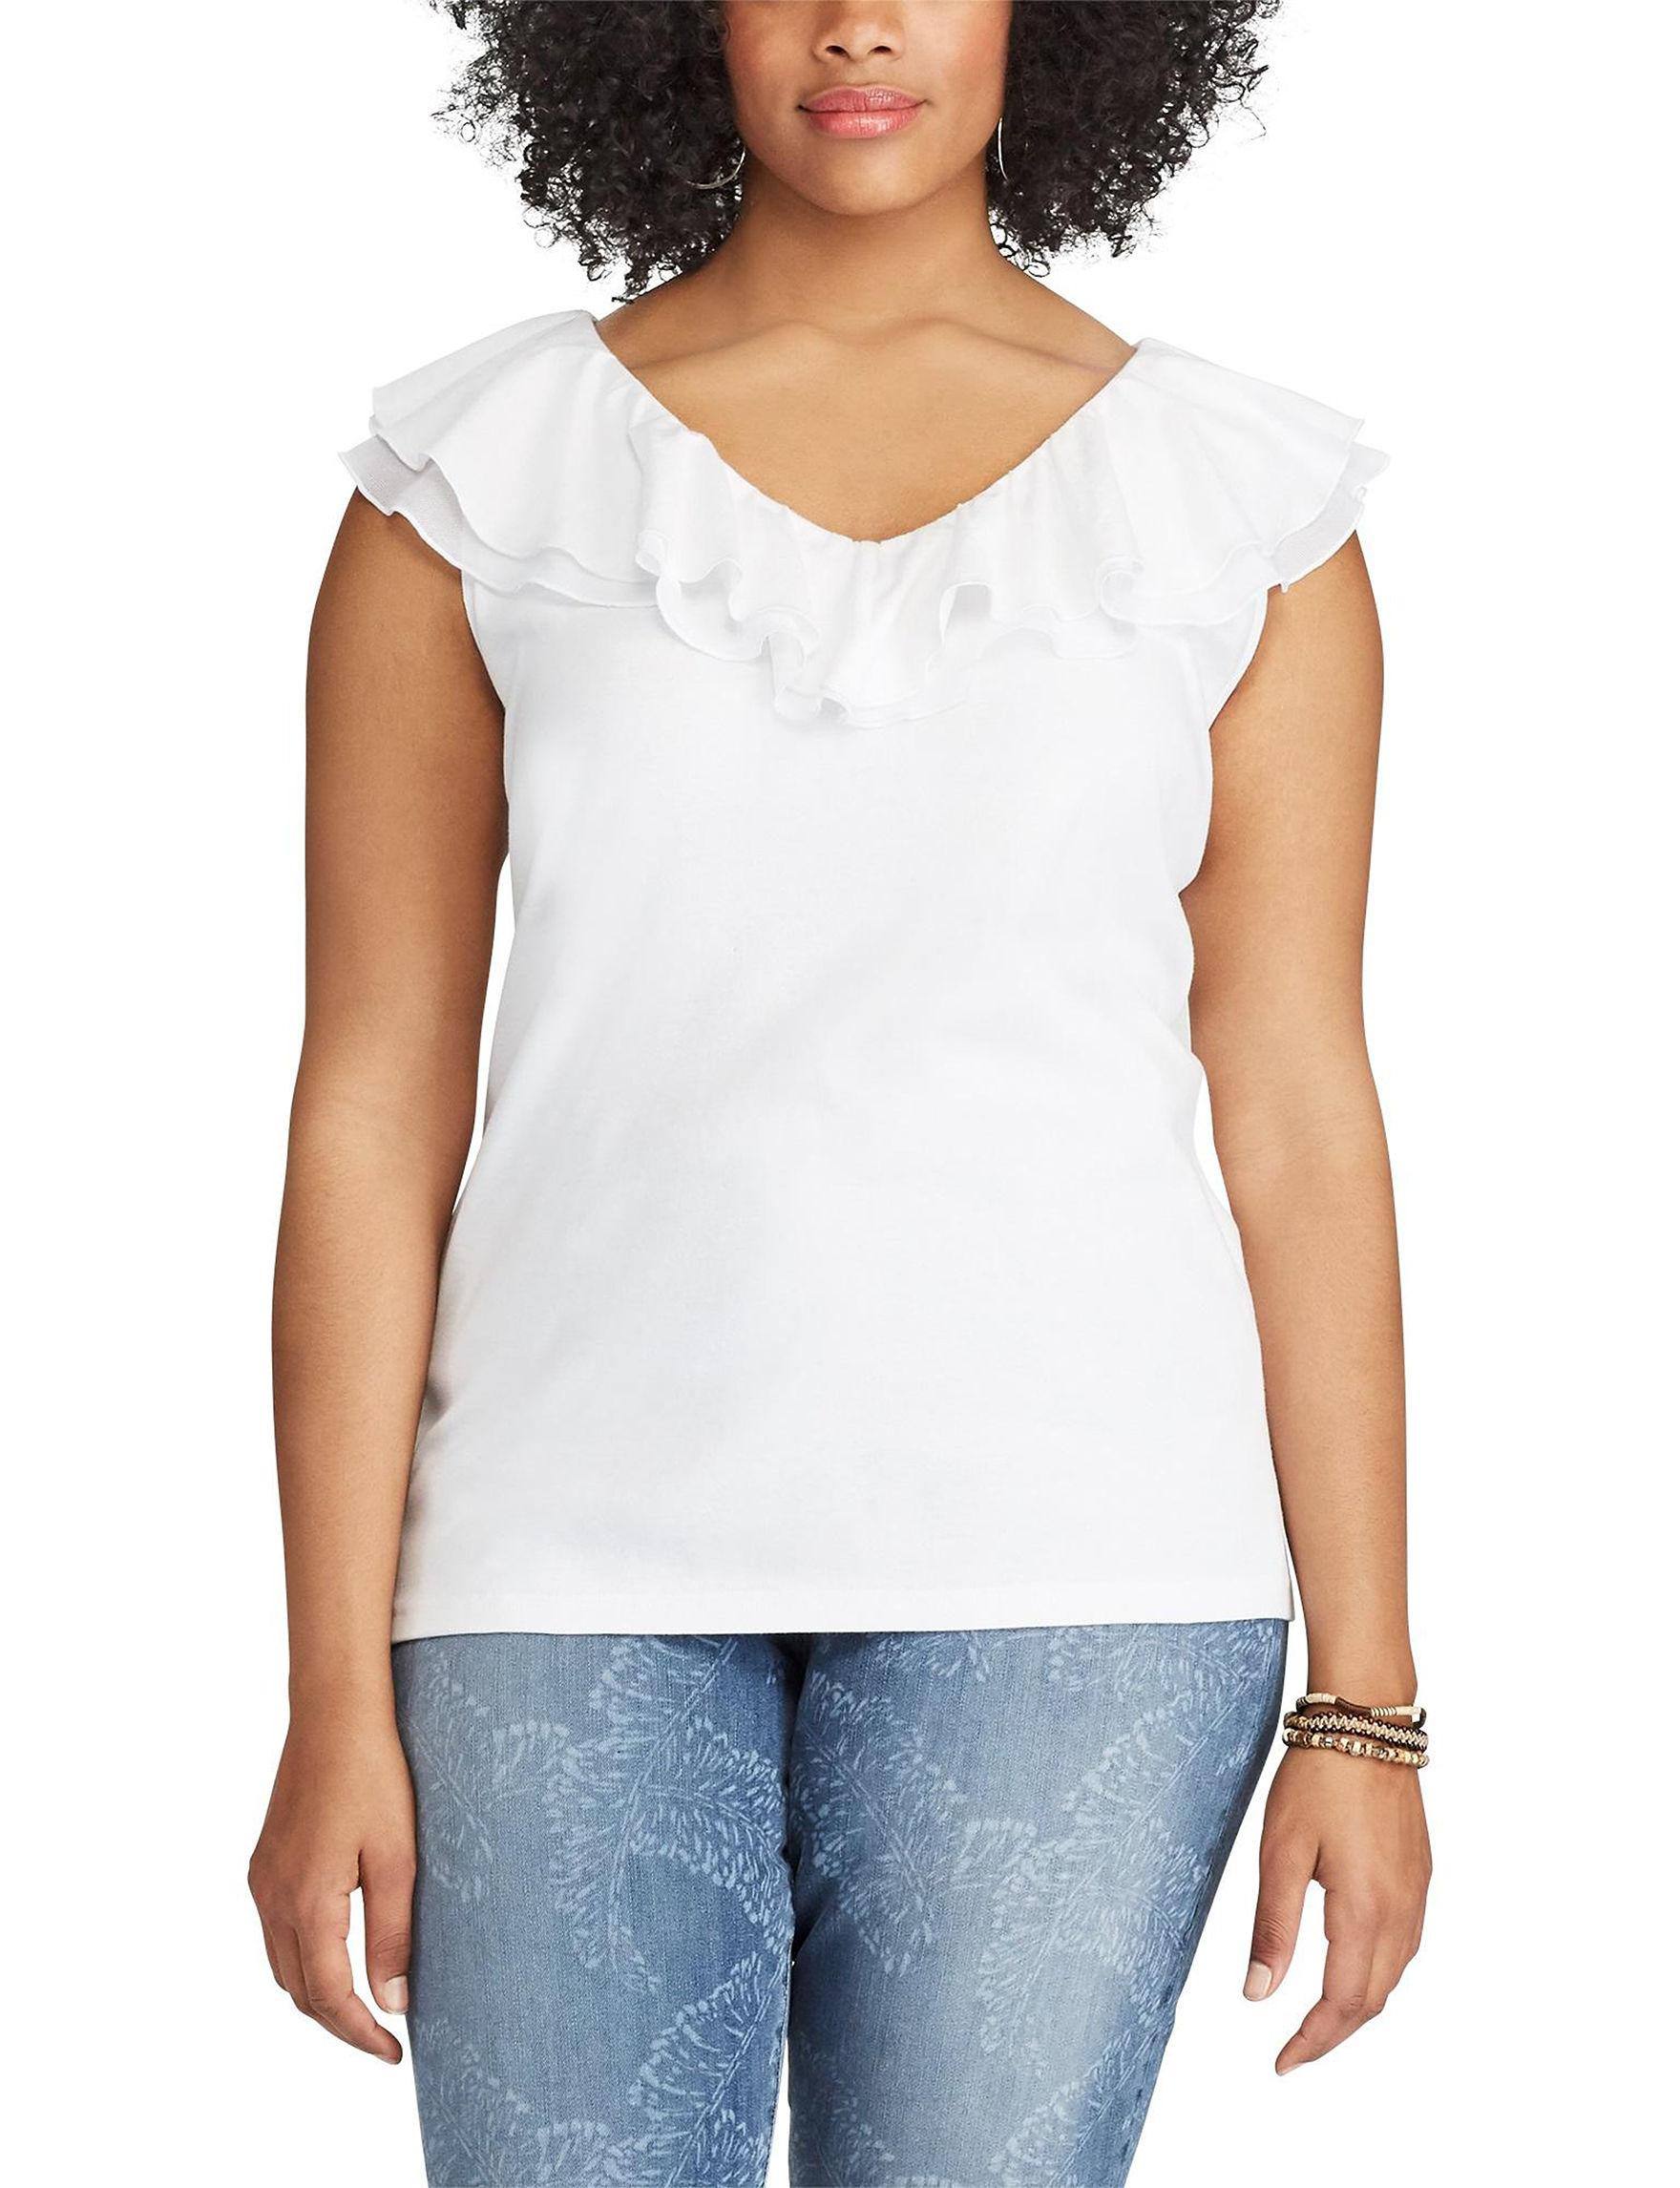 Chaps White Shirts & Blouses